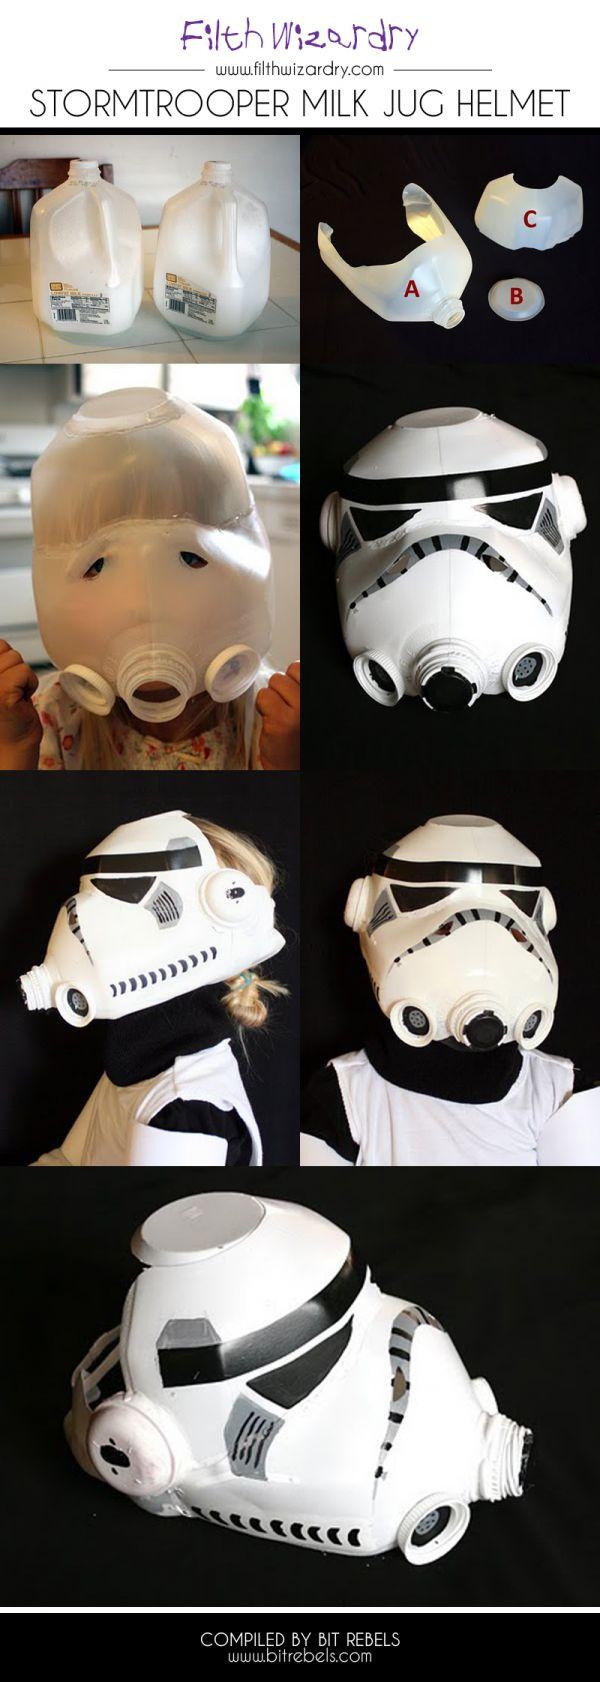 Darth Vaders armor  Wookieepedia  FANDOM powered by Wikia